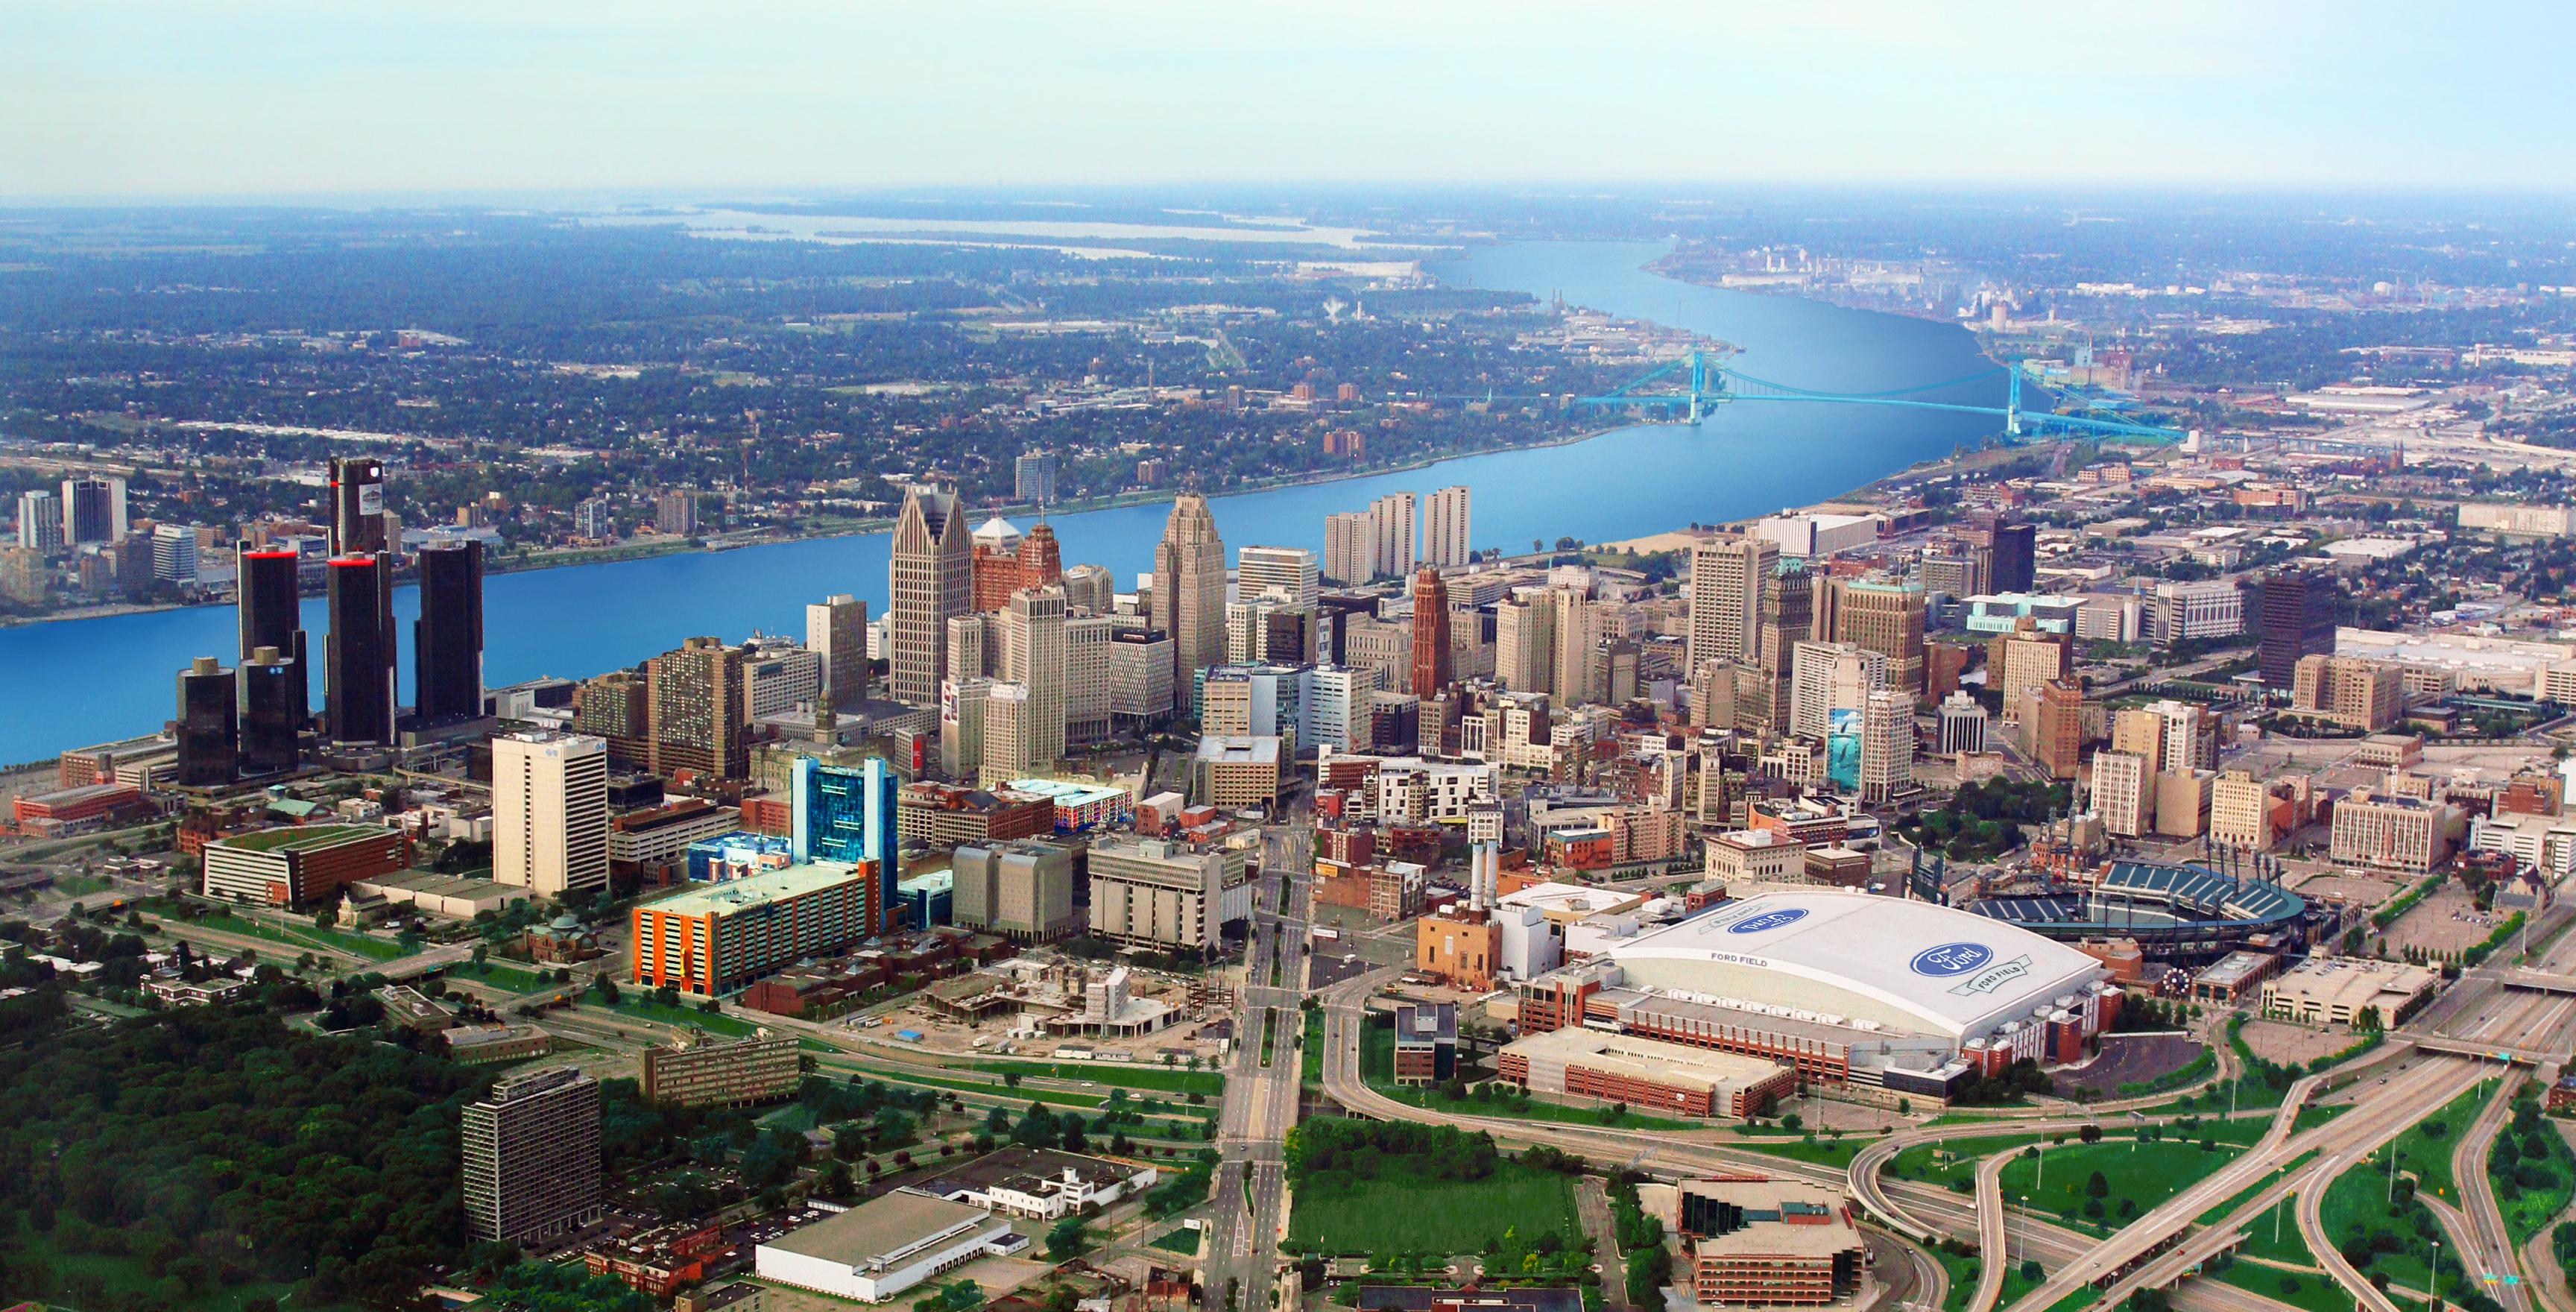 Guía de Detroit | Turismo en Detroit KAYAK